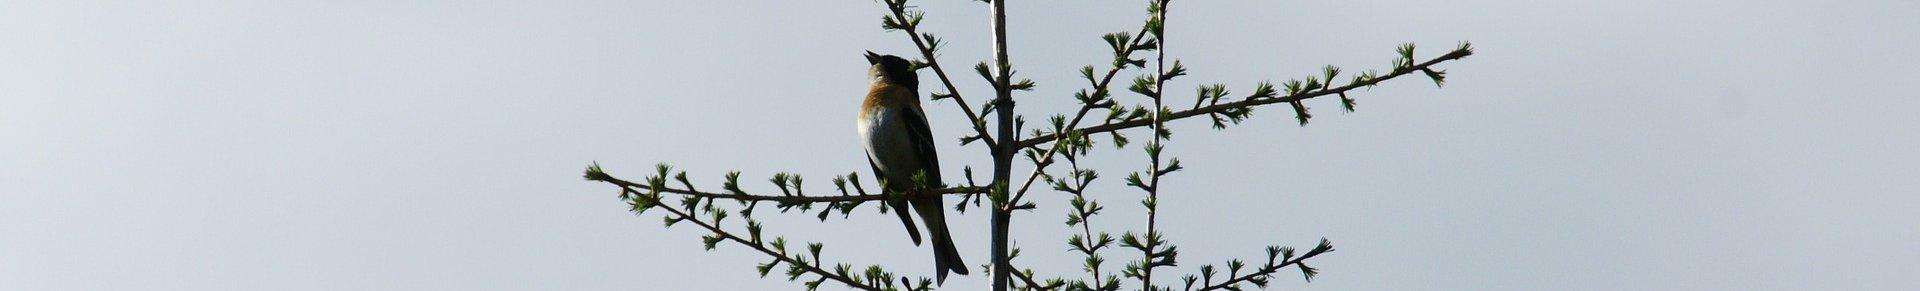 nightingale-752179_1920-aspect-ratio-192x29.1